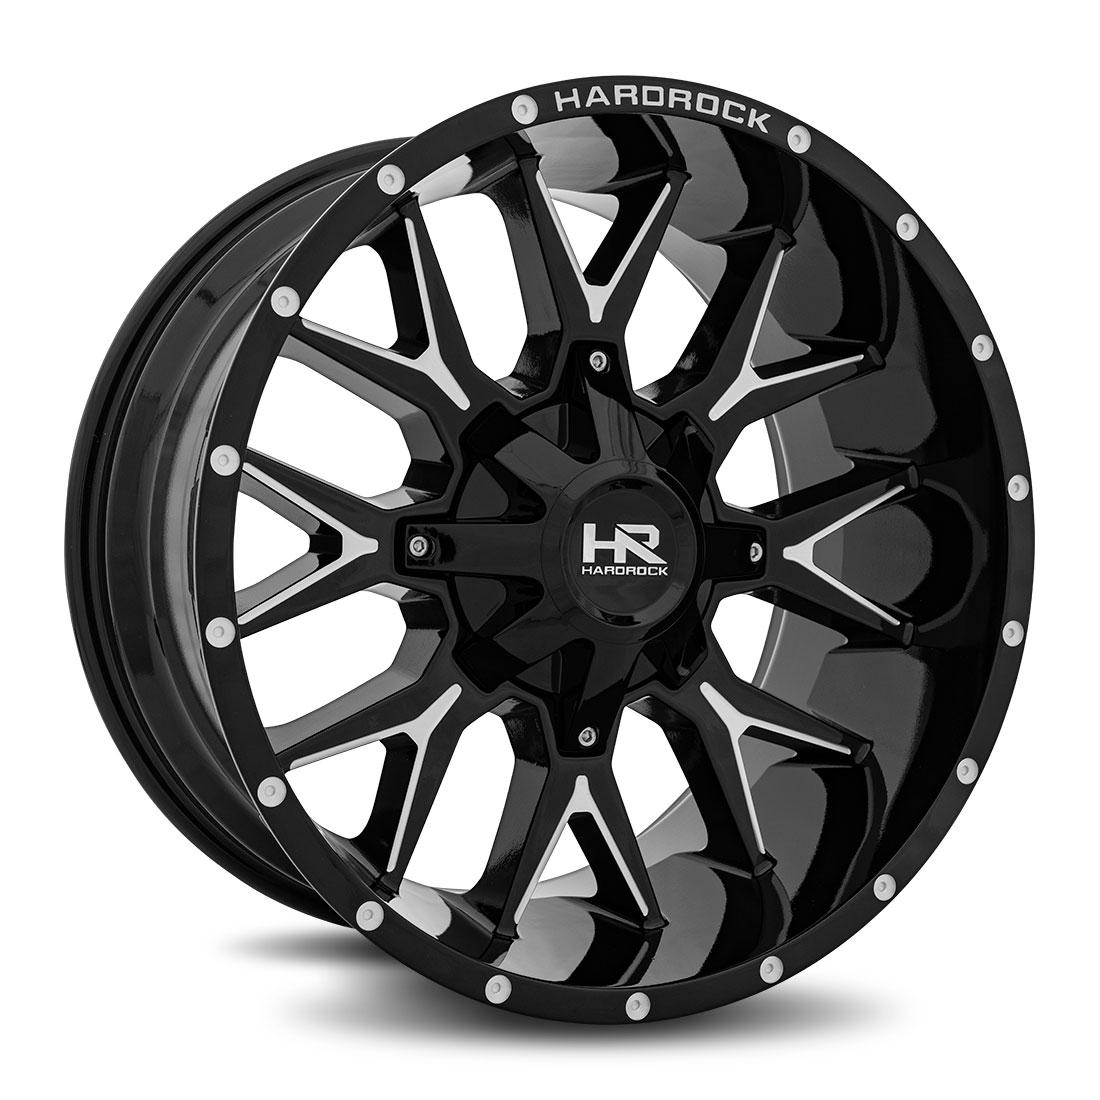 Hardrock Offroad Wheels H700 Affliction - Gloss Black Milled - 20x10